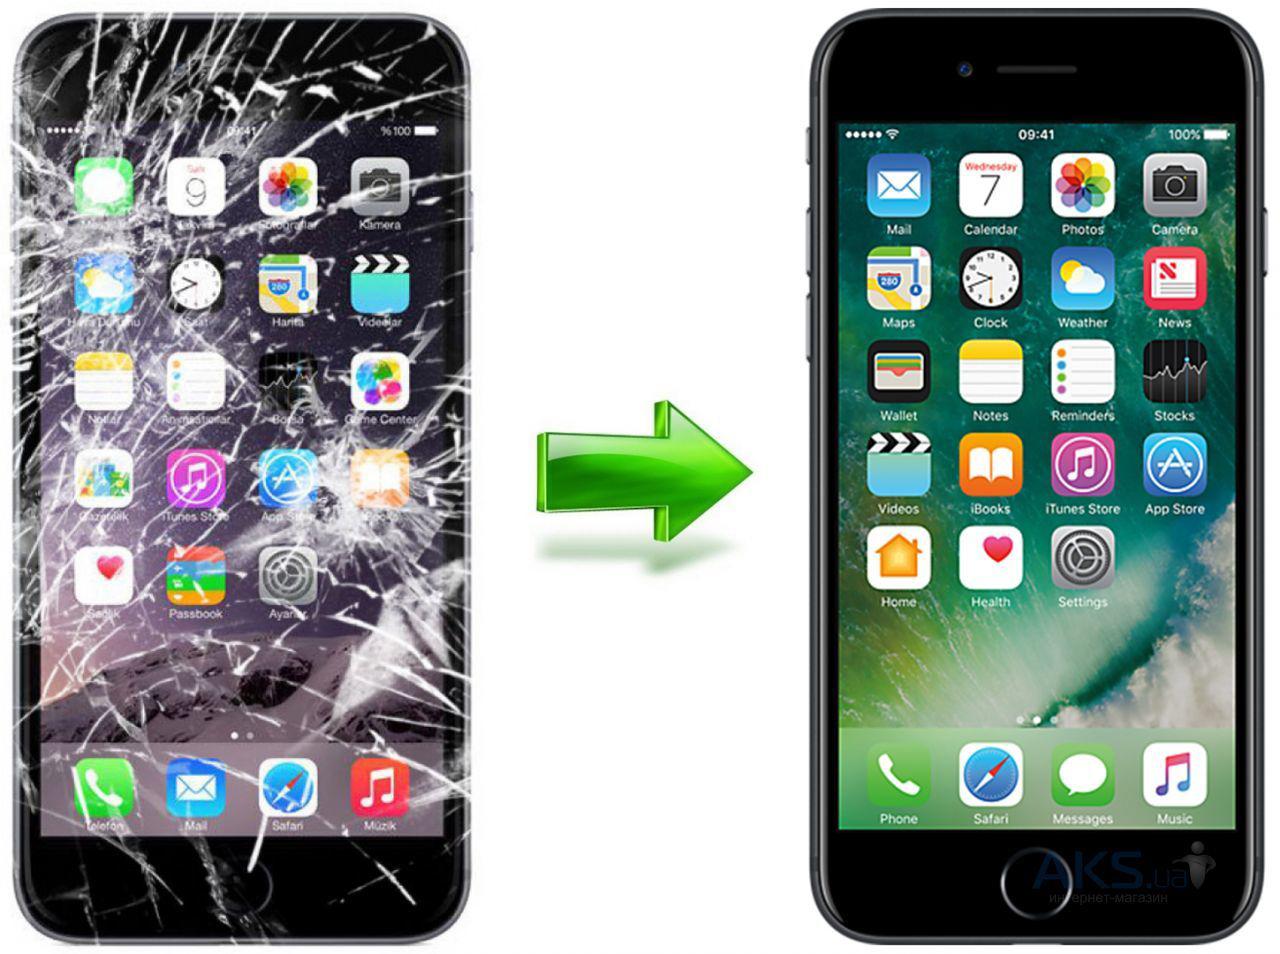 Замена сенсорного стекла (тачскрина) телефона - Украина